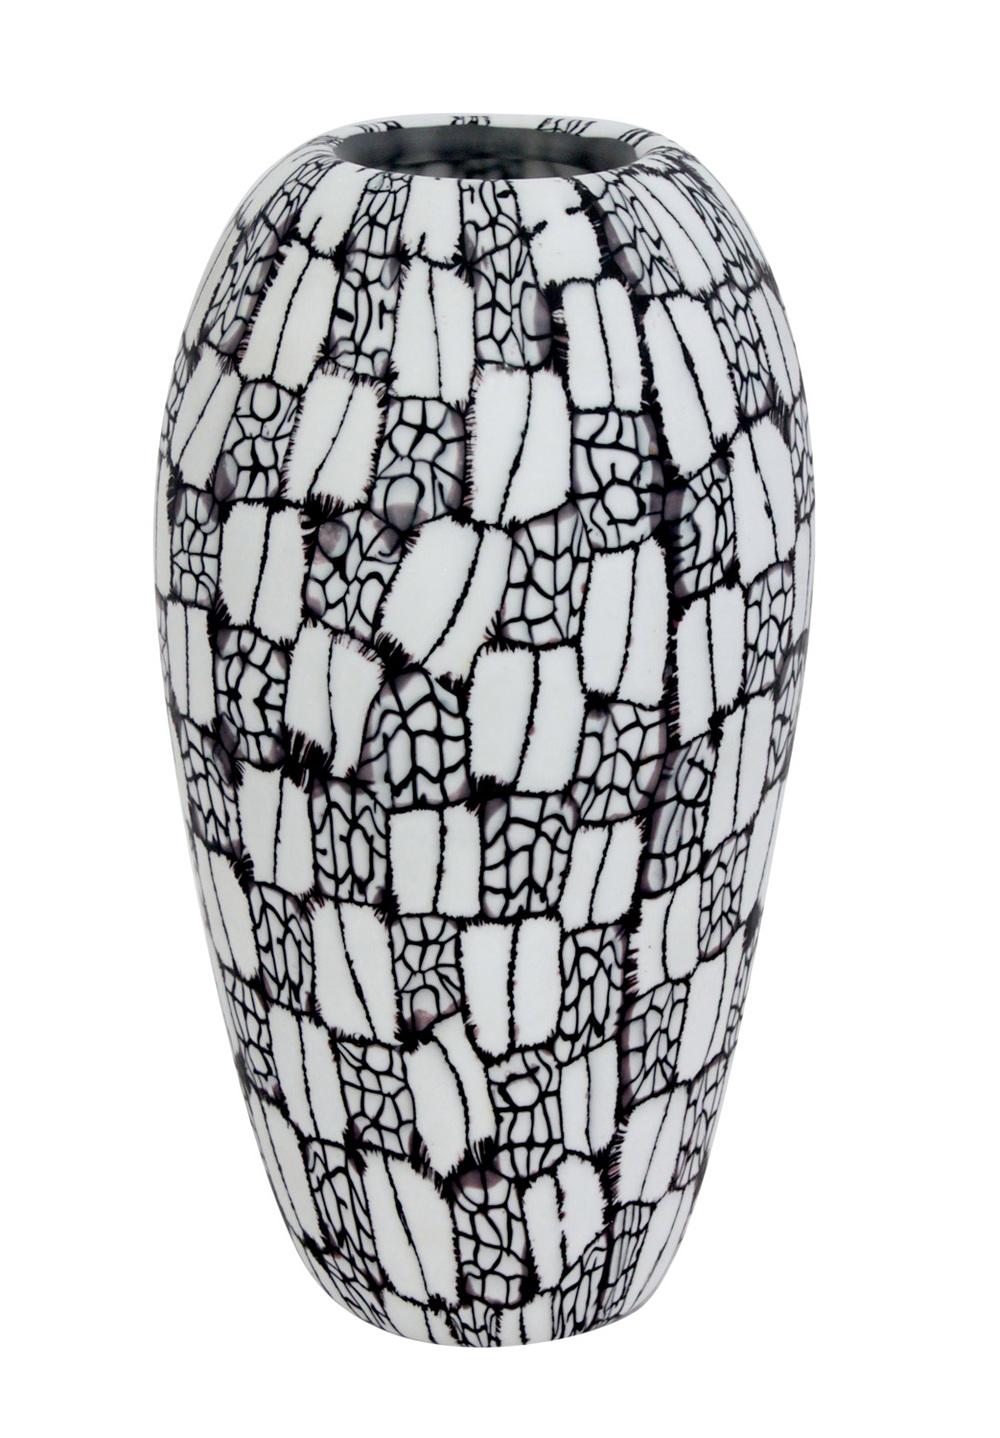 Vittorio Ferro 35 blk+white murrhine vases hires.jpg